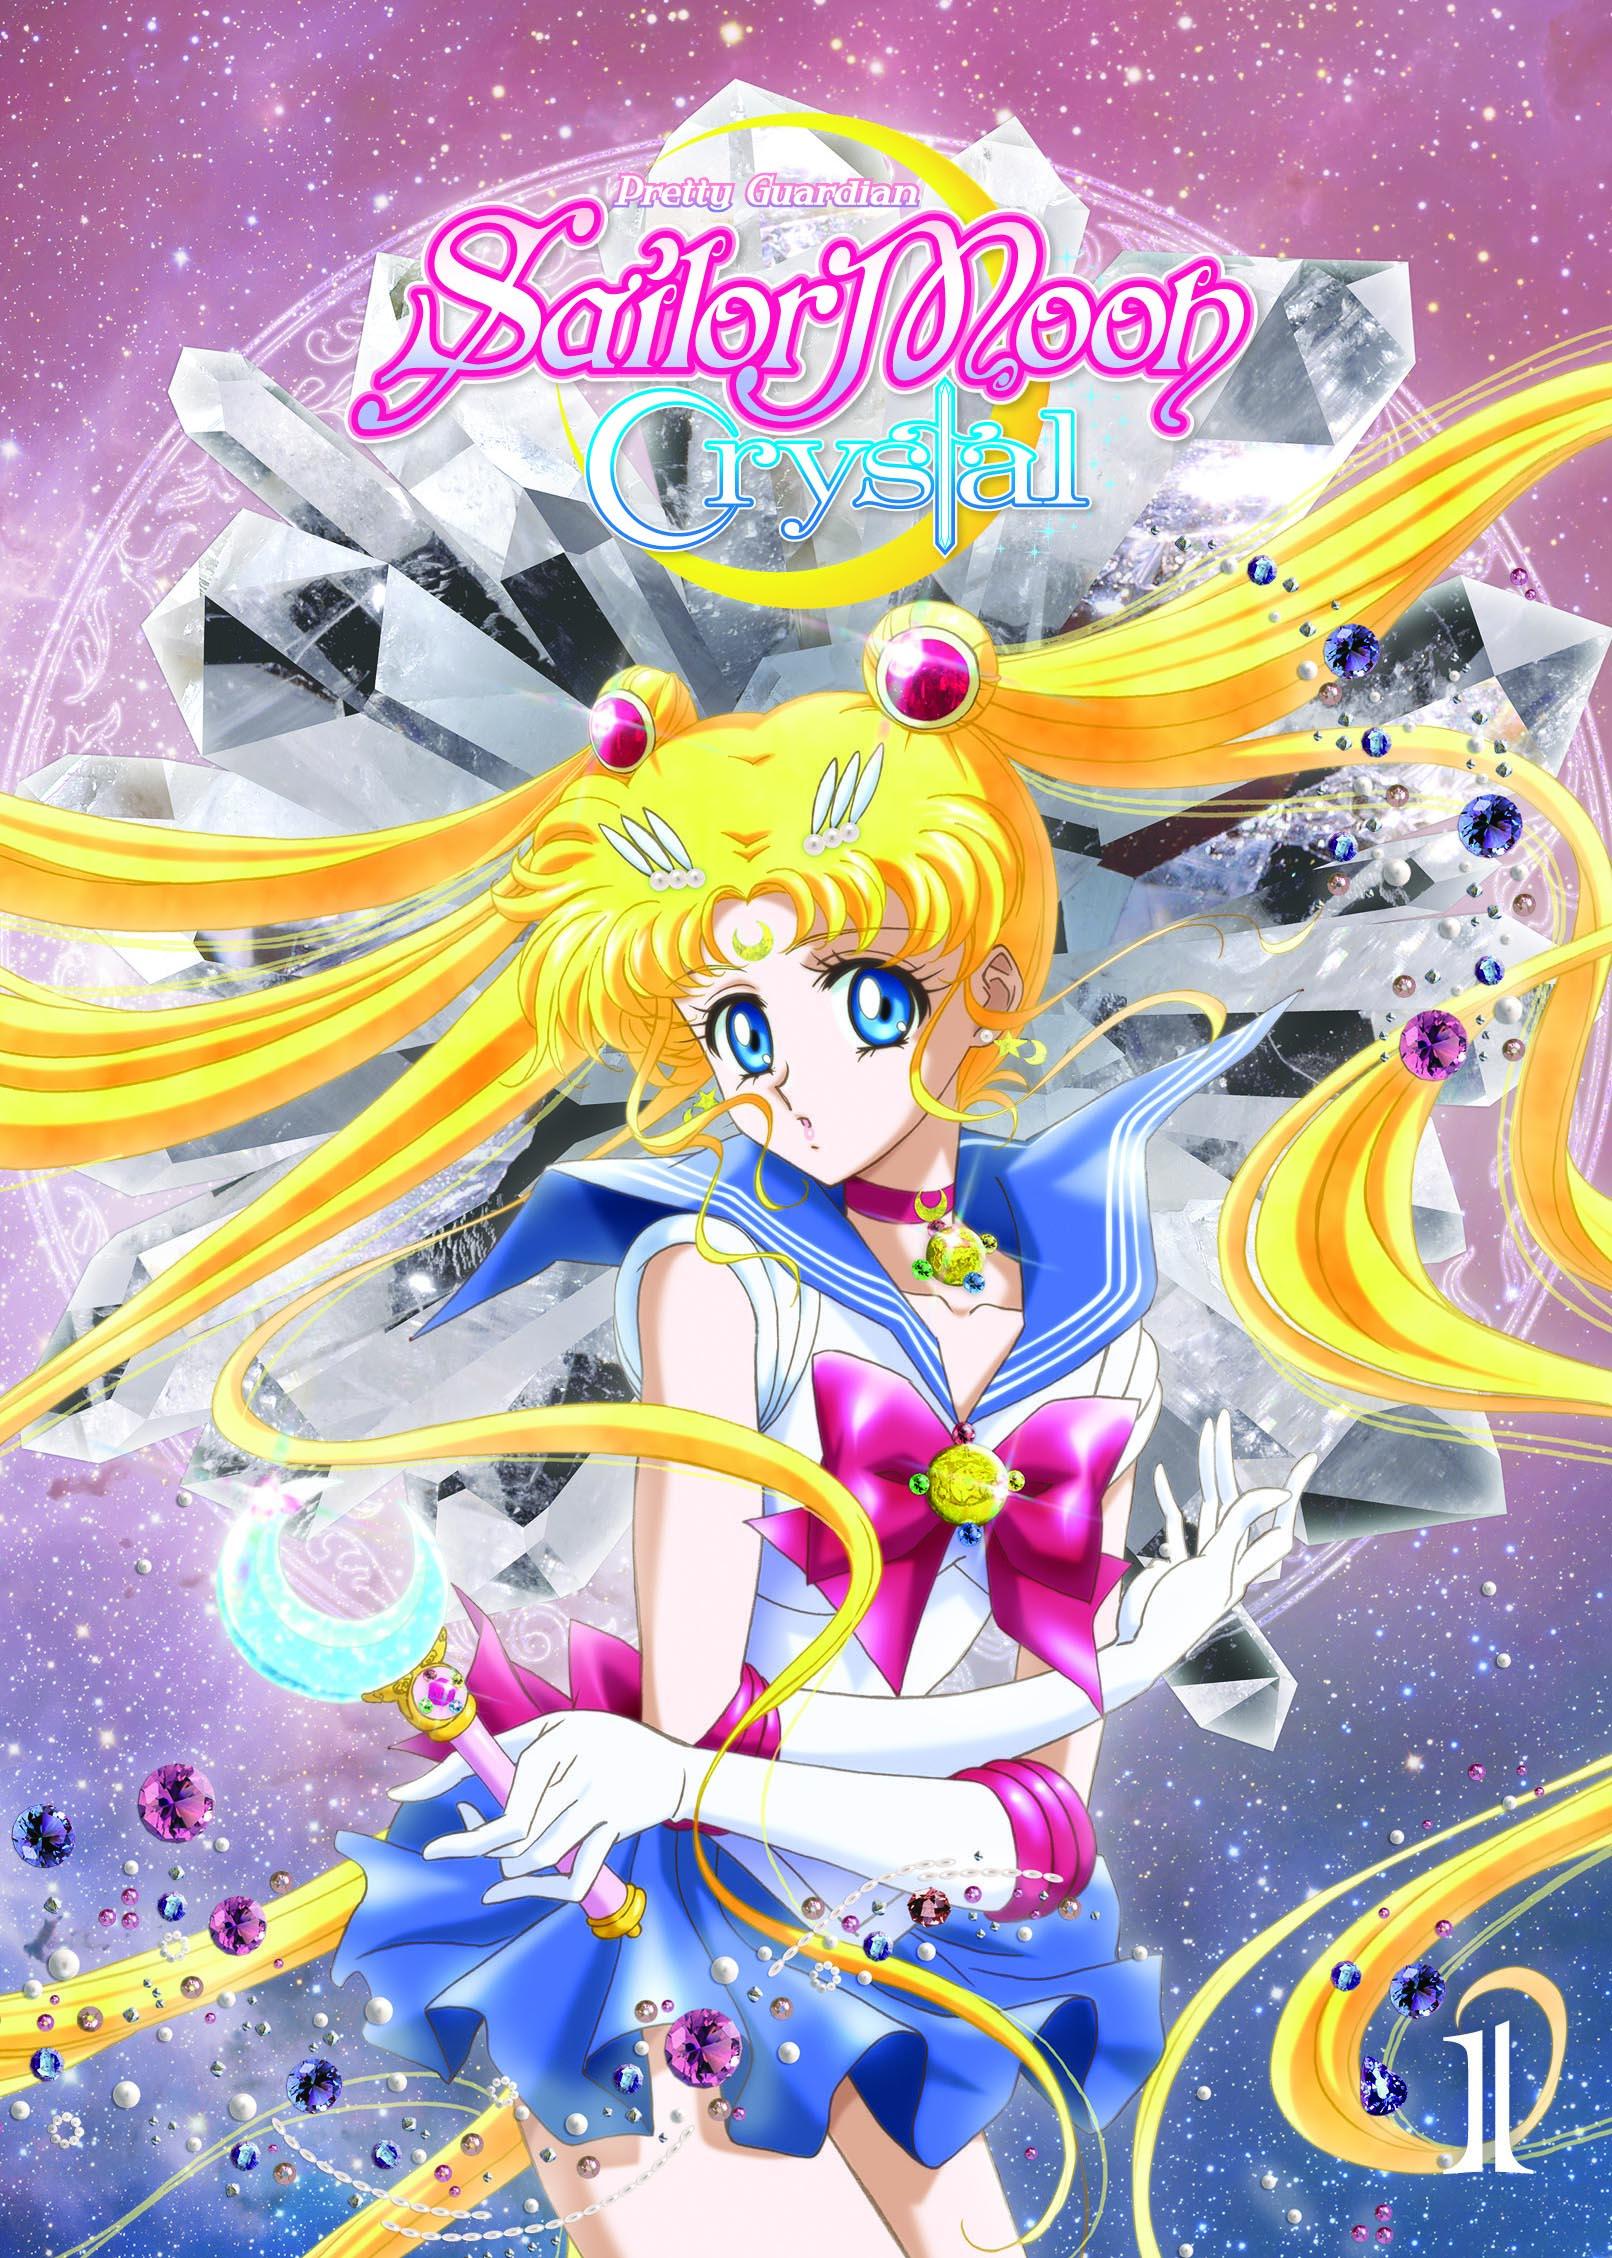 Pretty Guardian Sailor Moon Crystal Season 1 (English DVD)